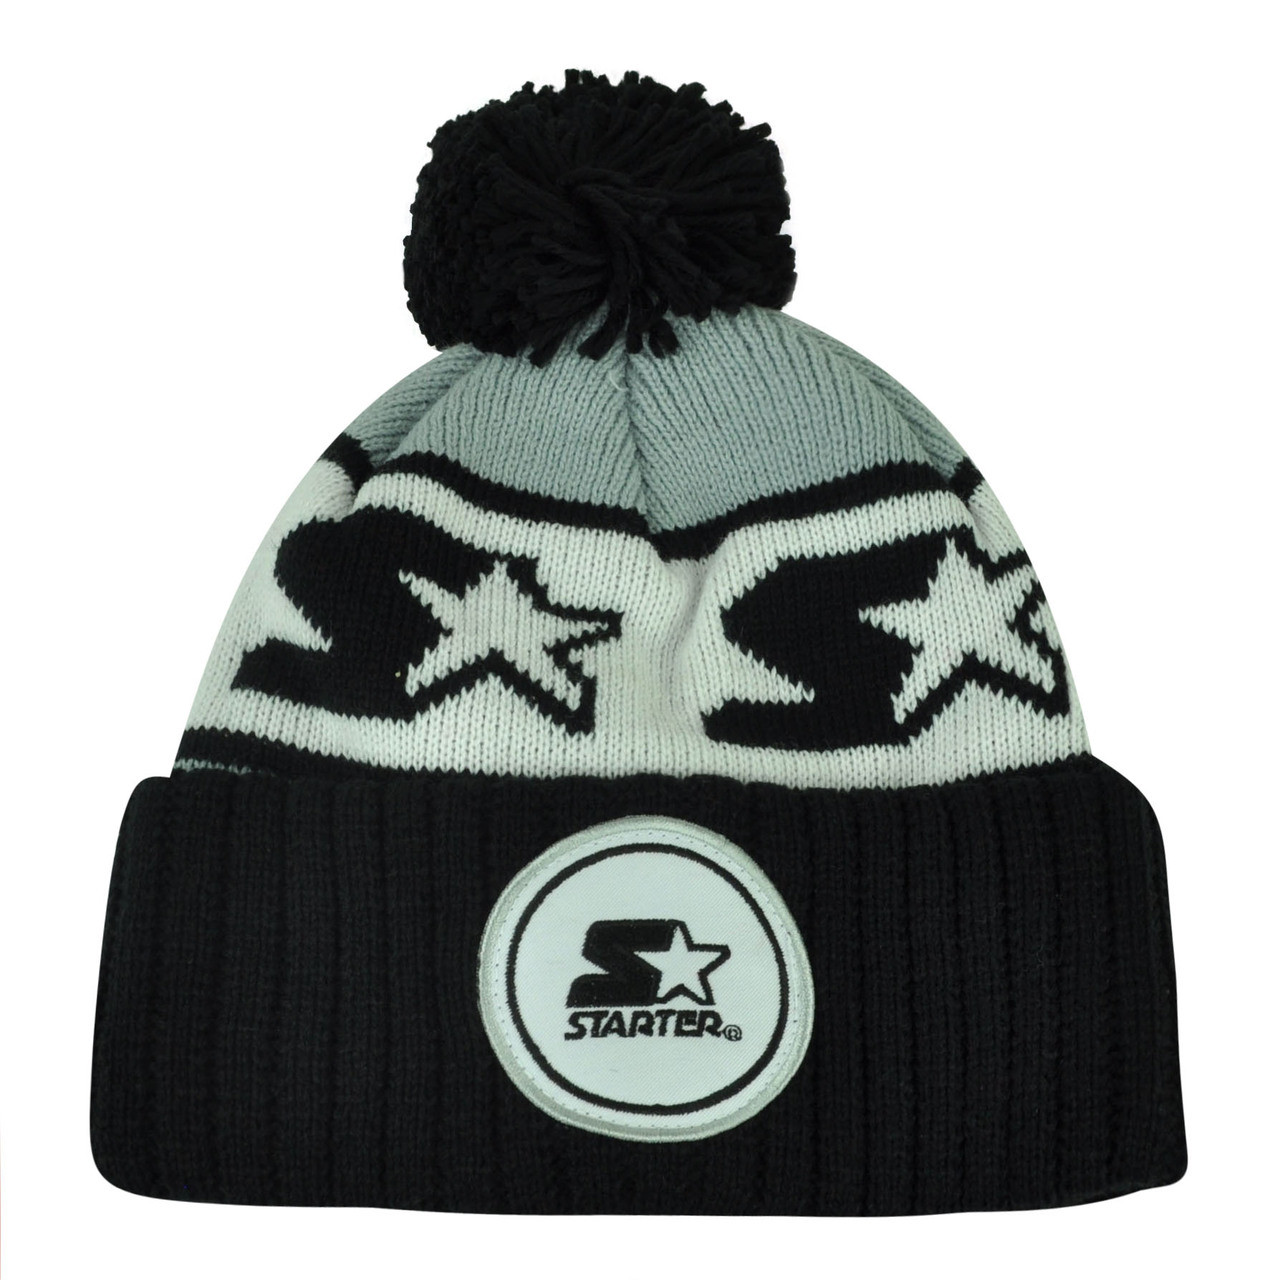 4312c2421847b Starter Blank Black Gray Pom Pom Beanie Knit Cuffed Toque Solid Plain Winter  - Cap Store Online.com